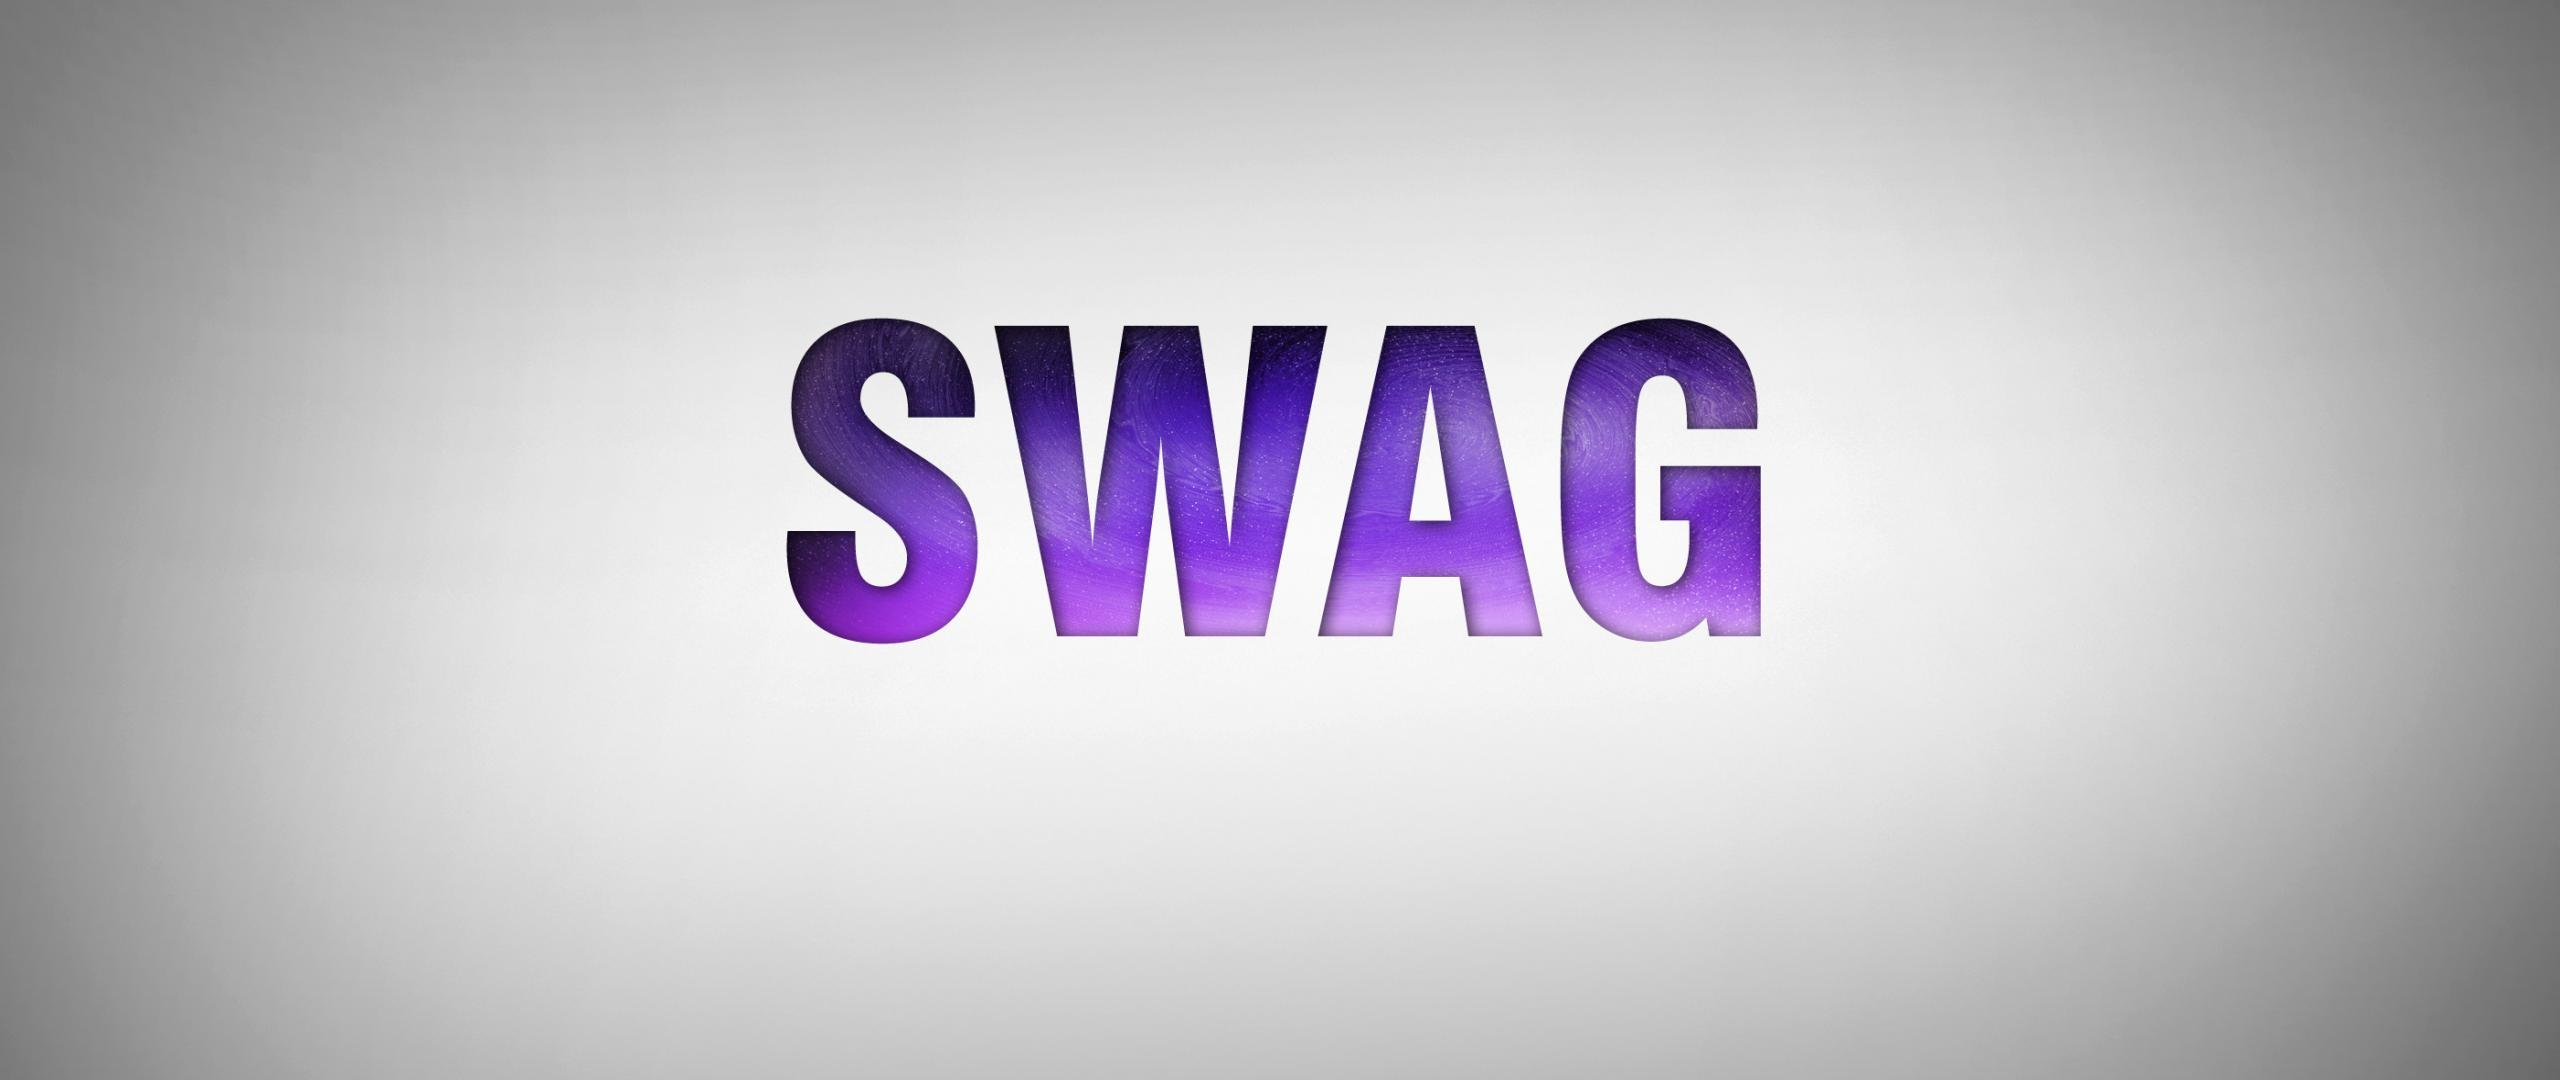 Popular Wallpaper Logo Swag - swag-wallpaper-hd-2560x1080-81535  You Should Have_96815.jpg